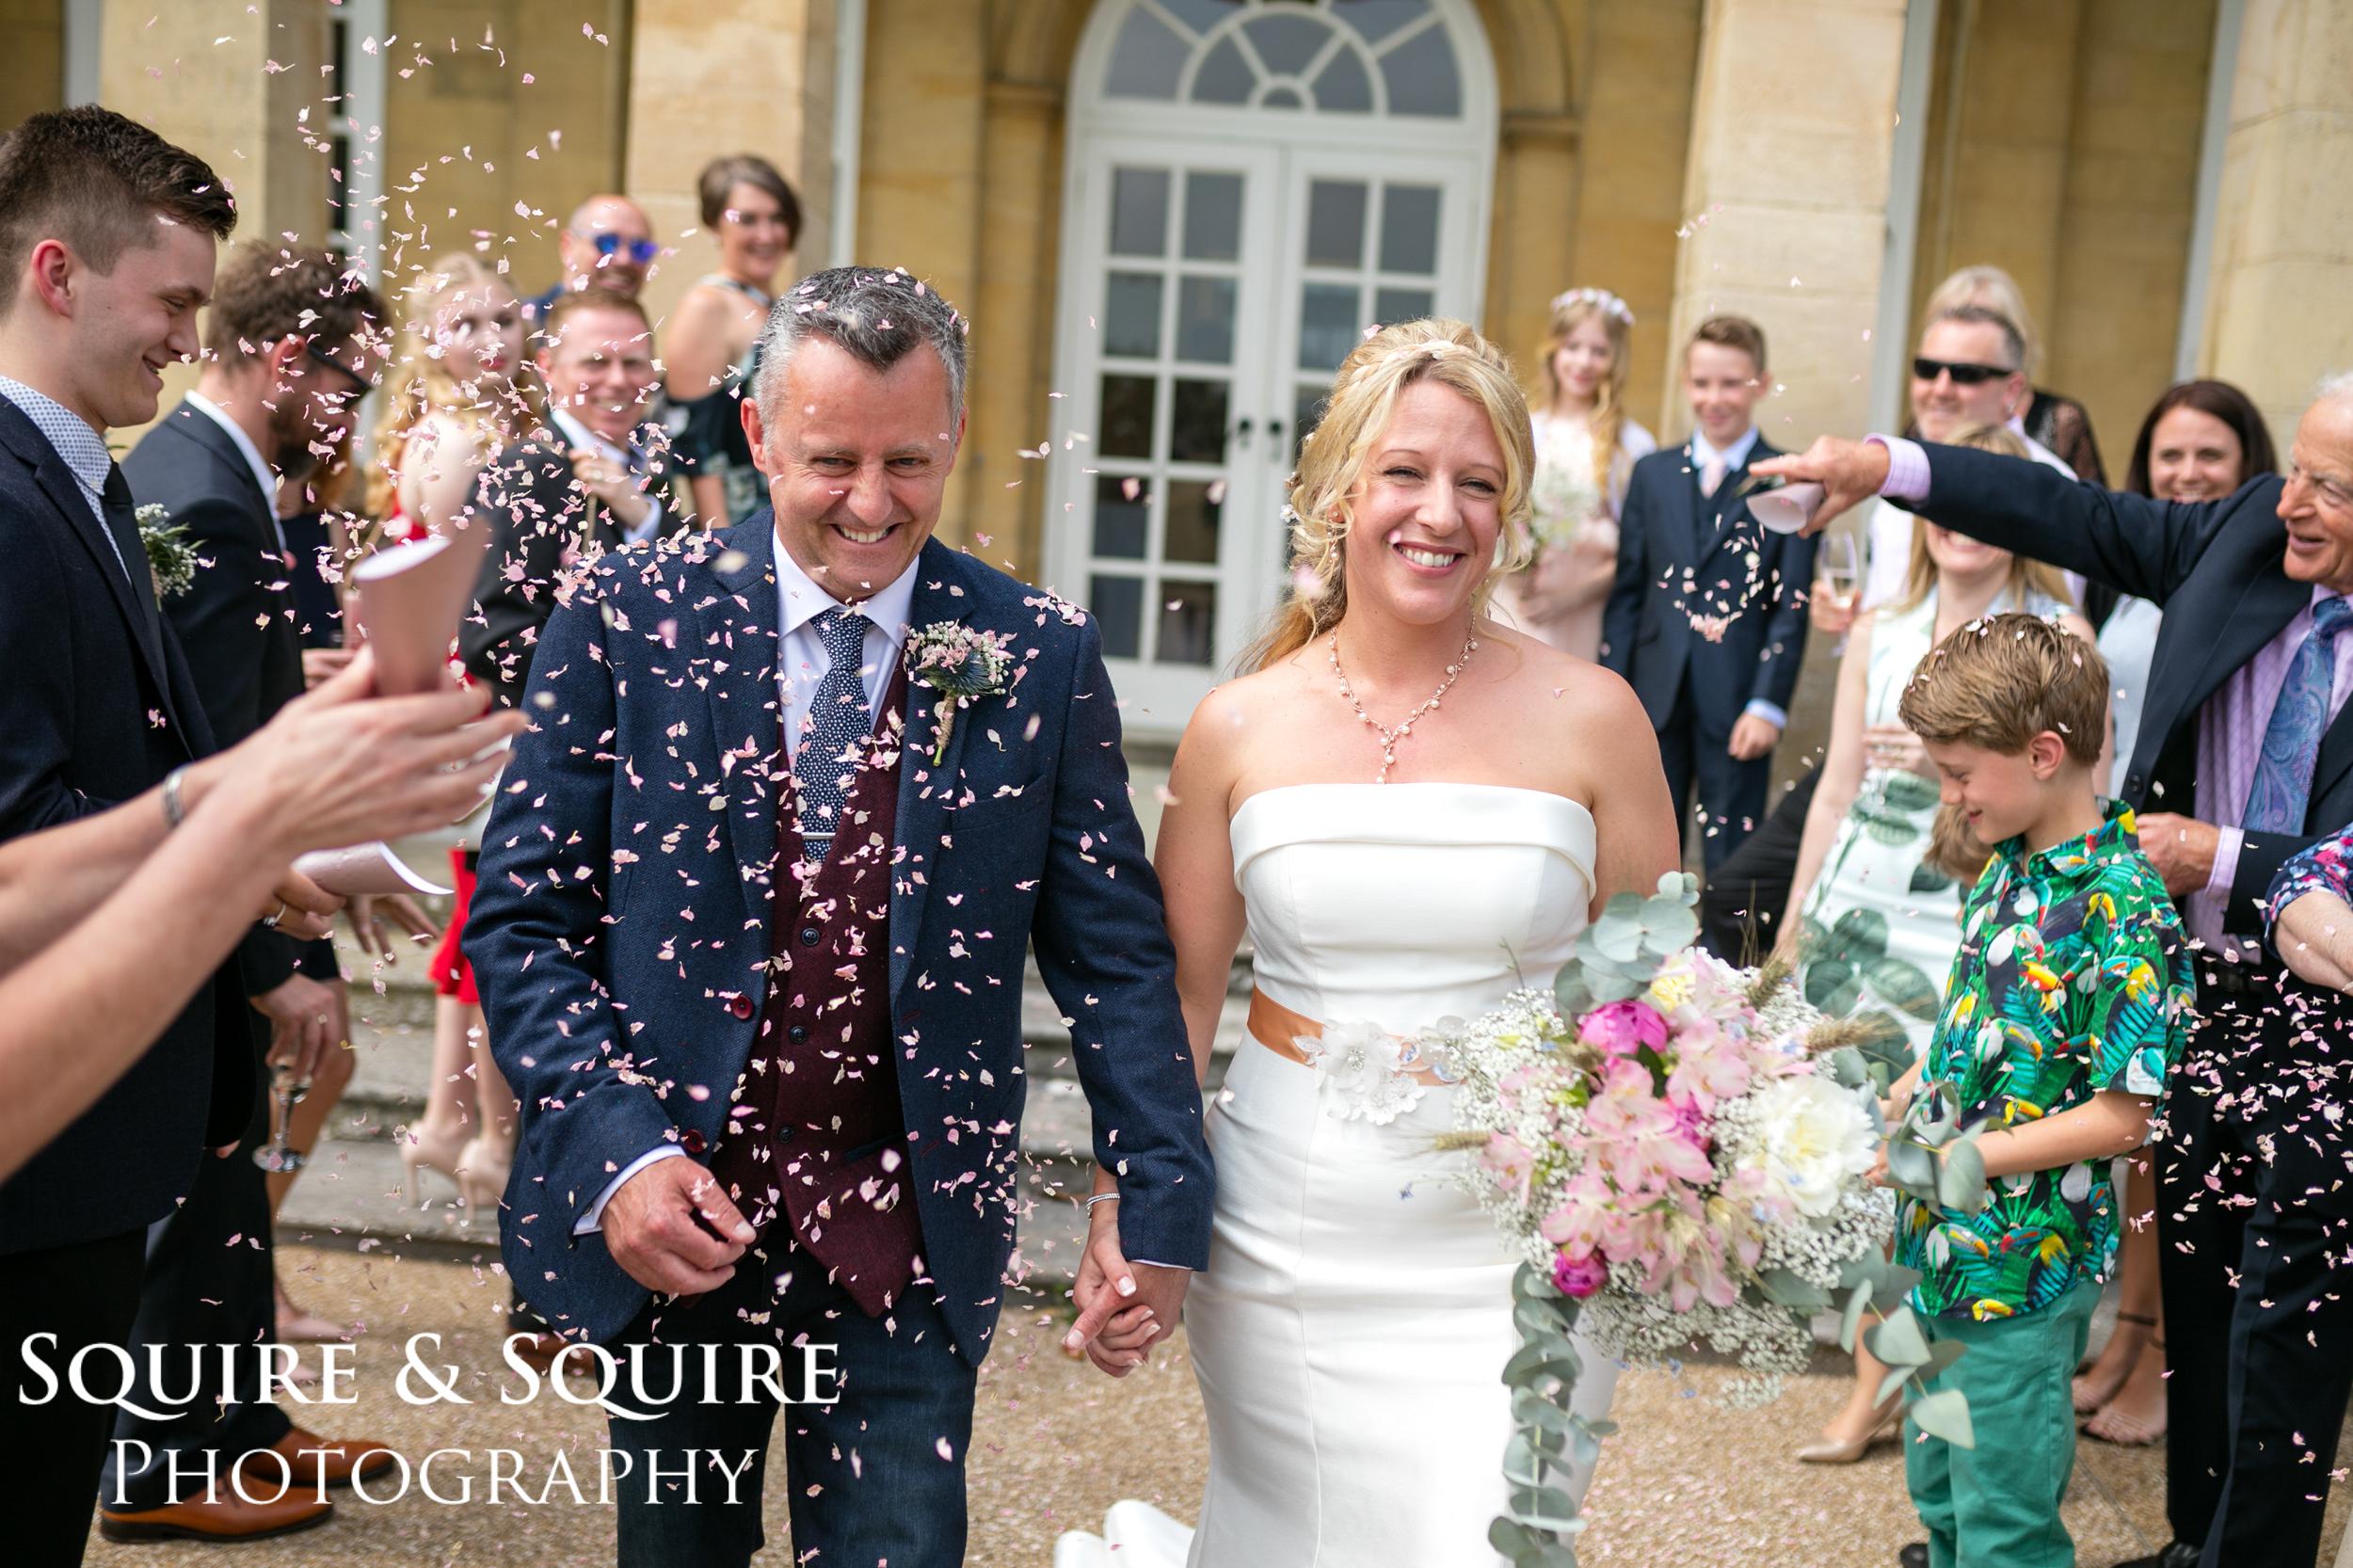 wedding_photography_catthorpe Manor (50 of 66).jpg